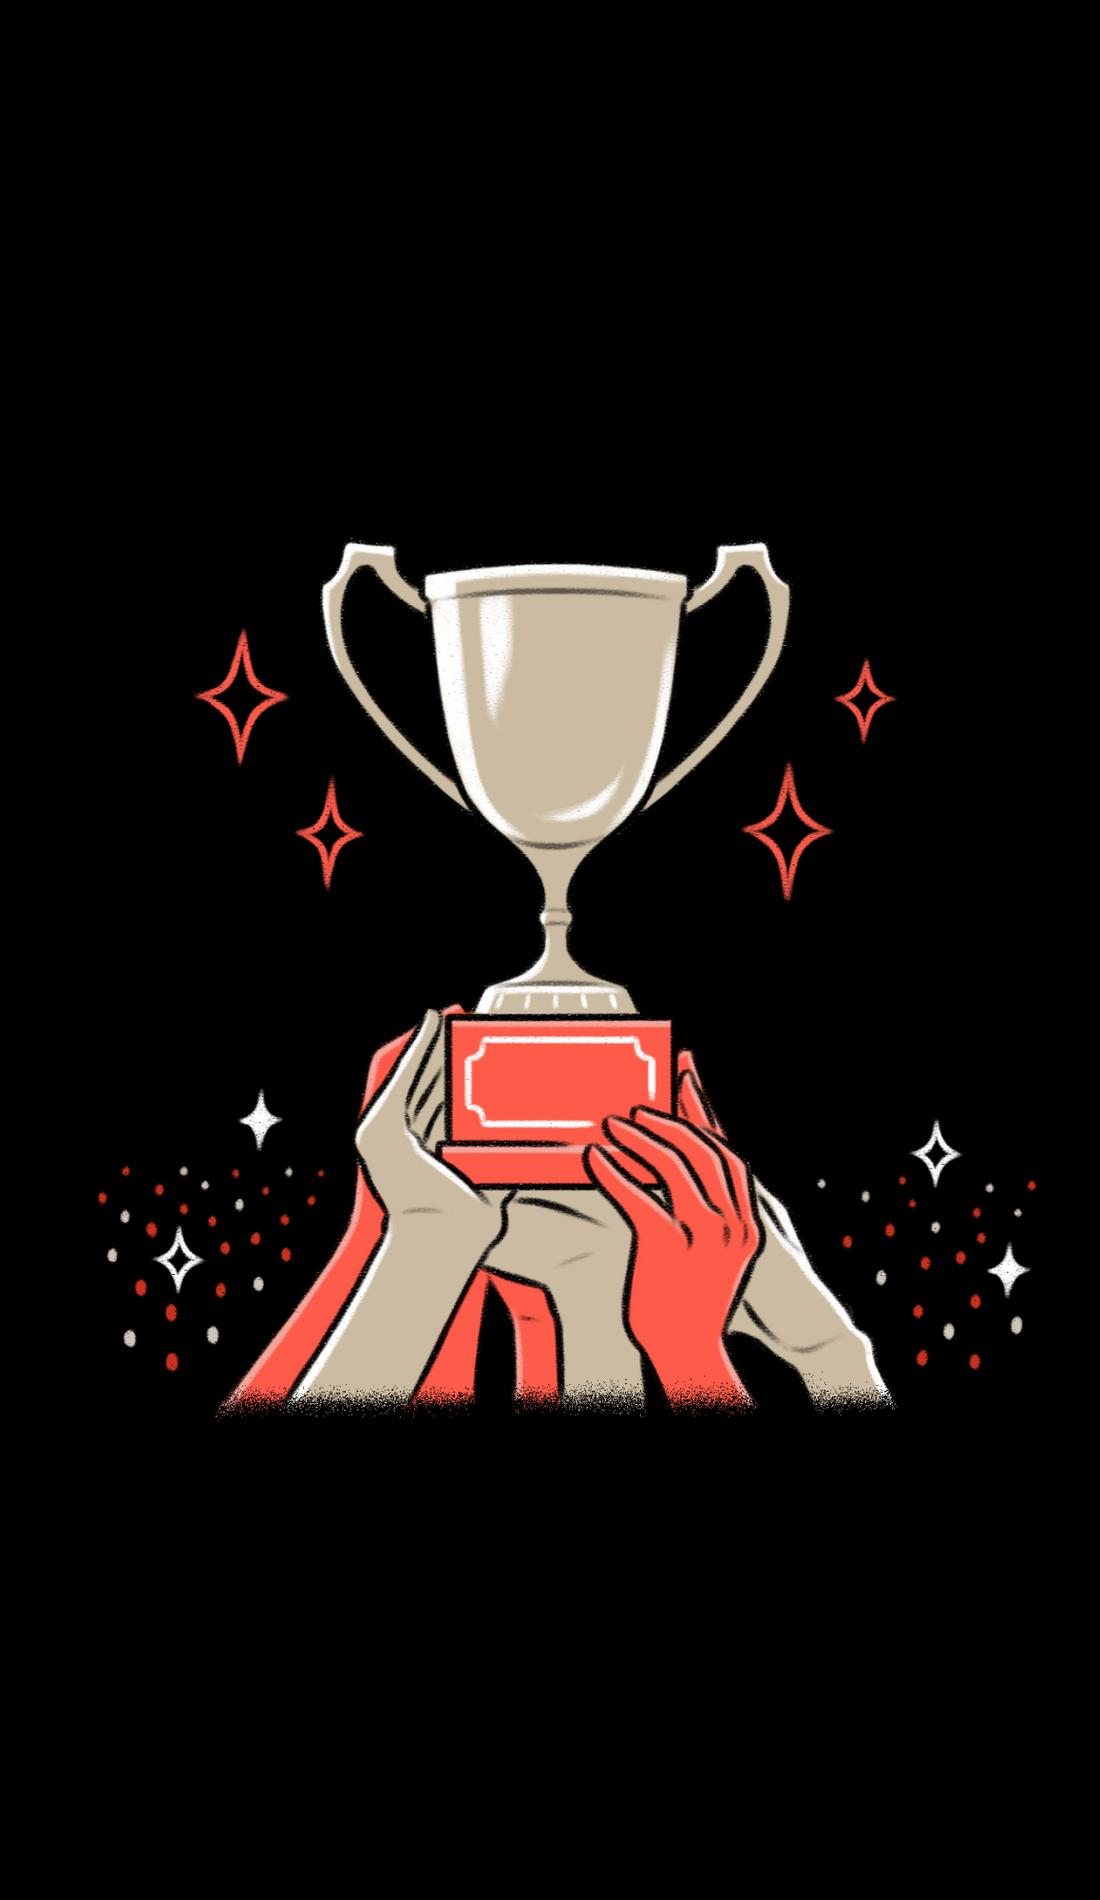 A NFL Hall of Fame Enshrinement Ceremony live event